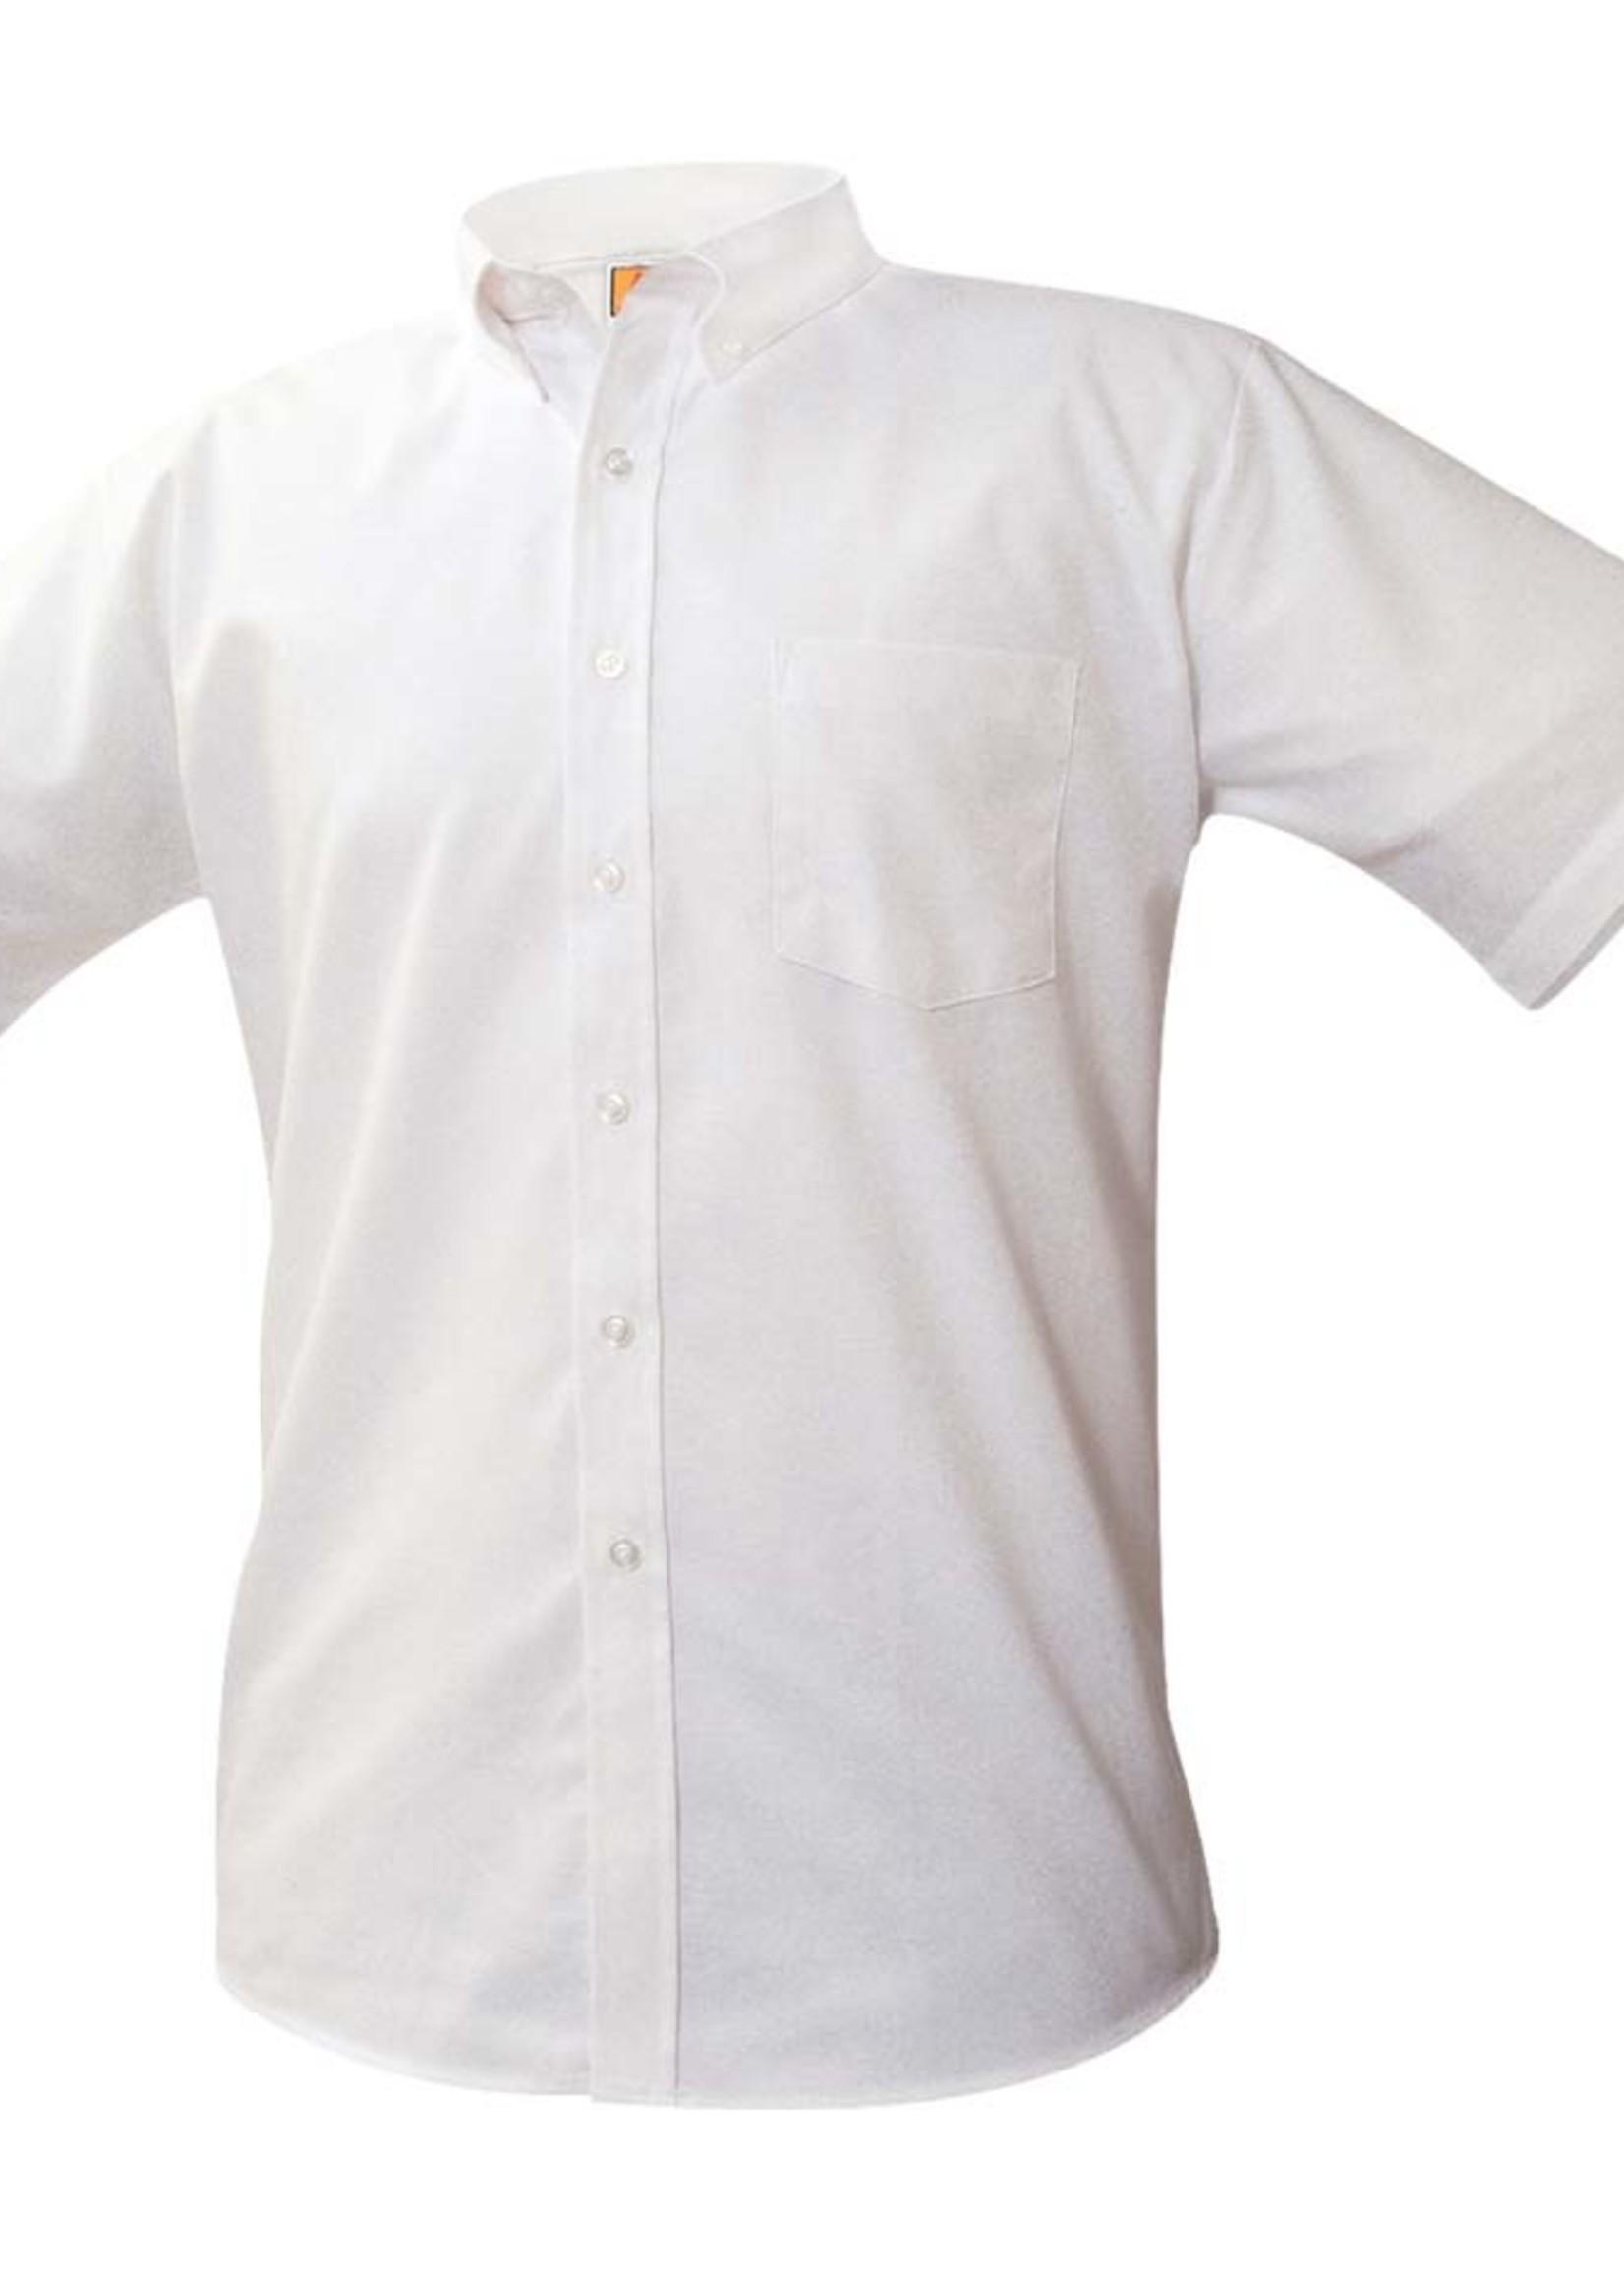 Null White Short Sleeve Oxford Shirt